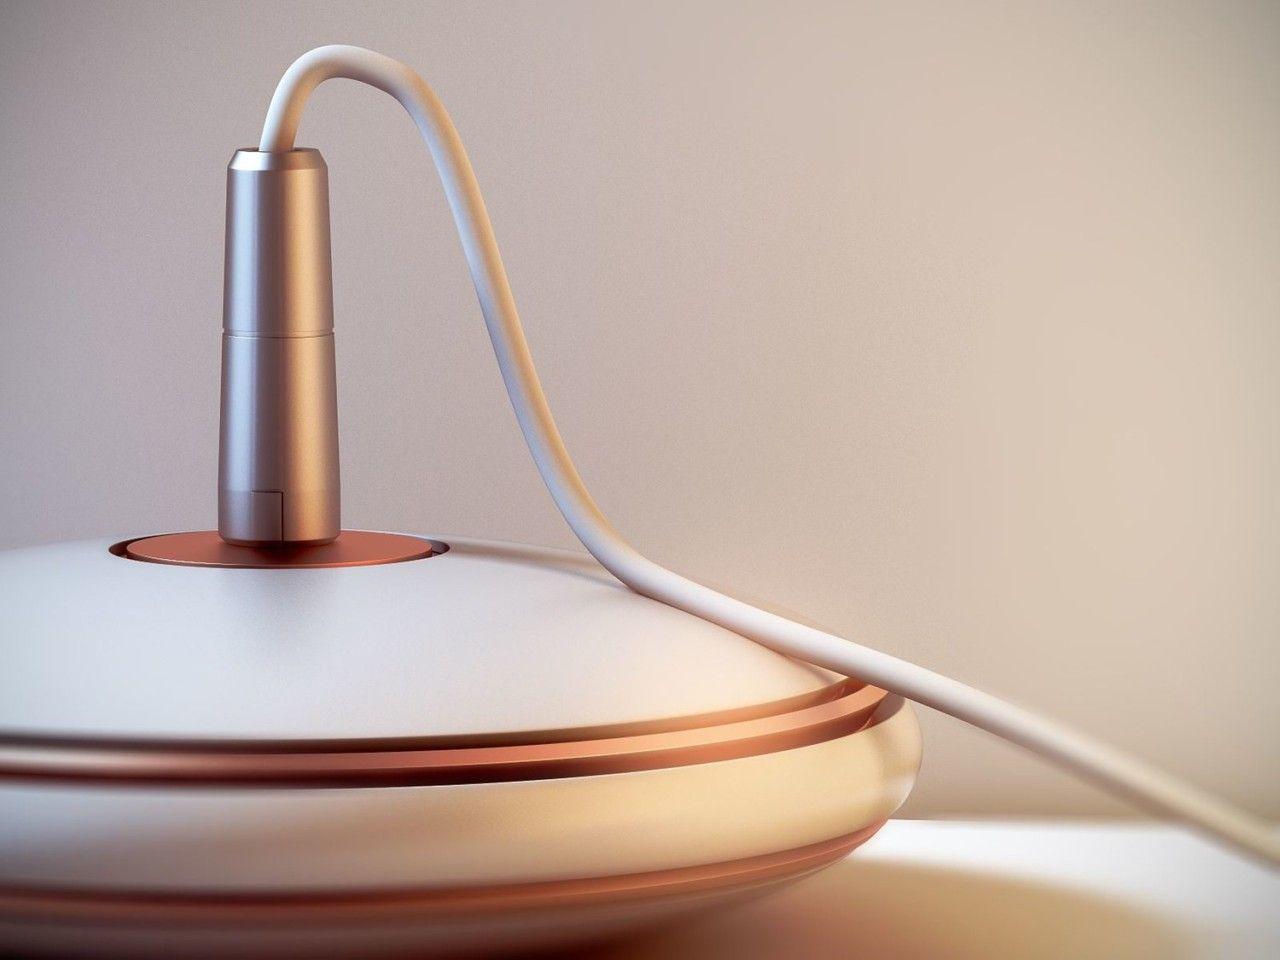 The Orb Illuminates Danish Design And Smart Led Lighting Interior Led Lights Led Light Design Interior Design Software